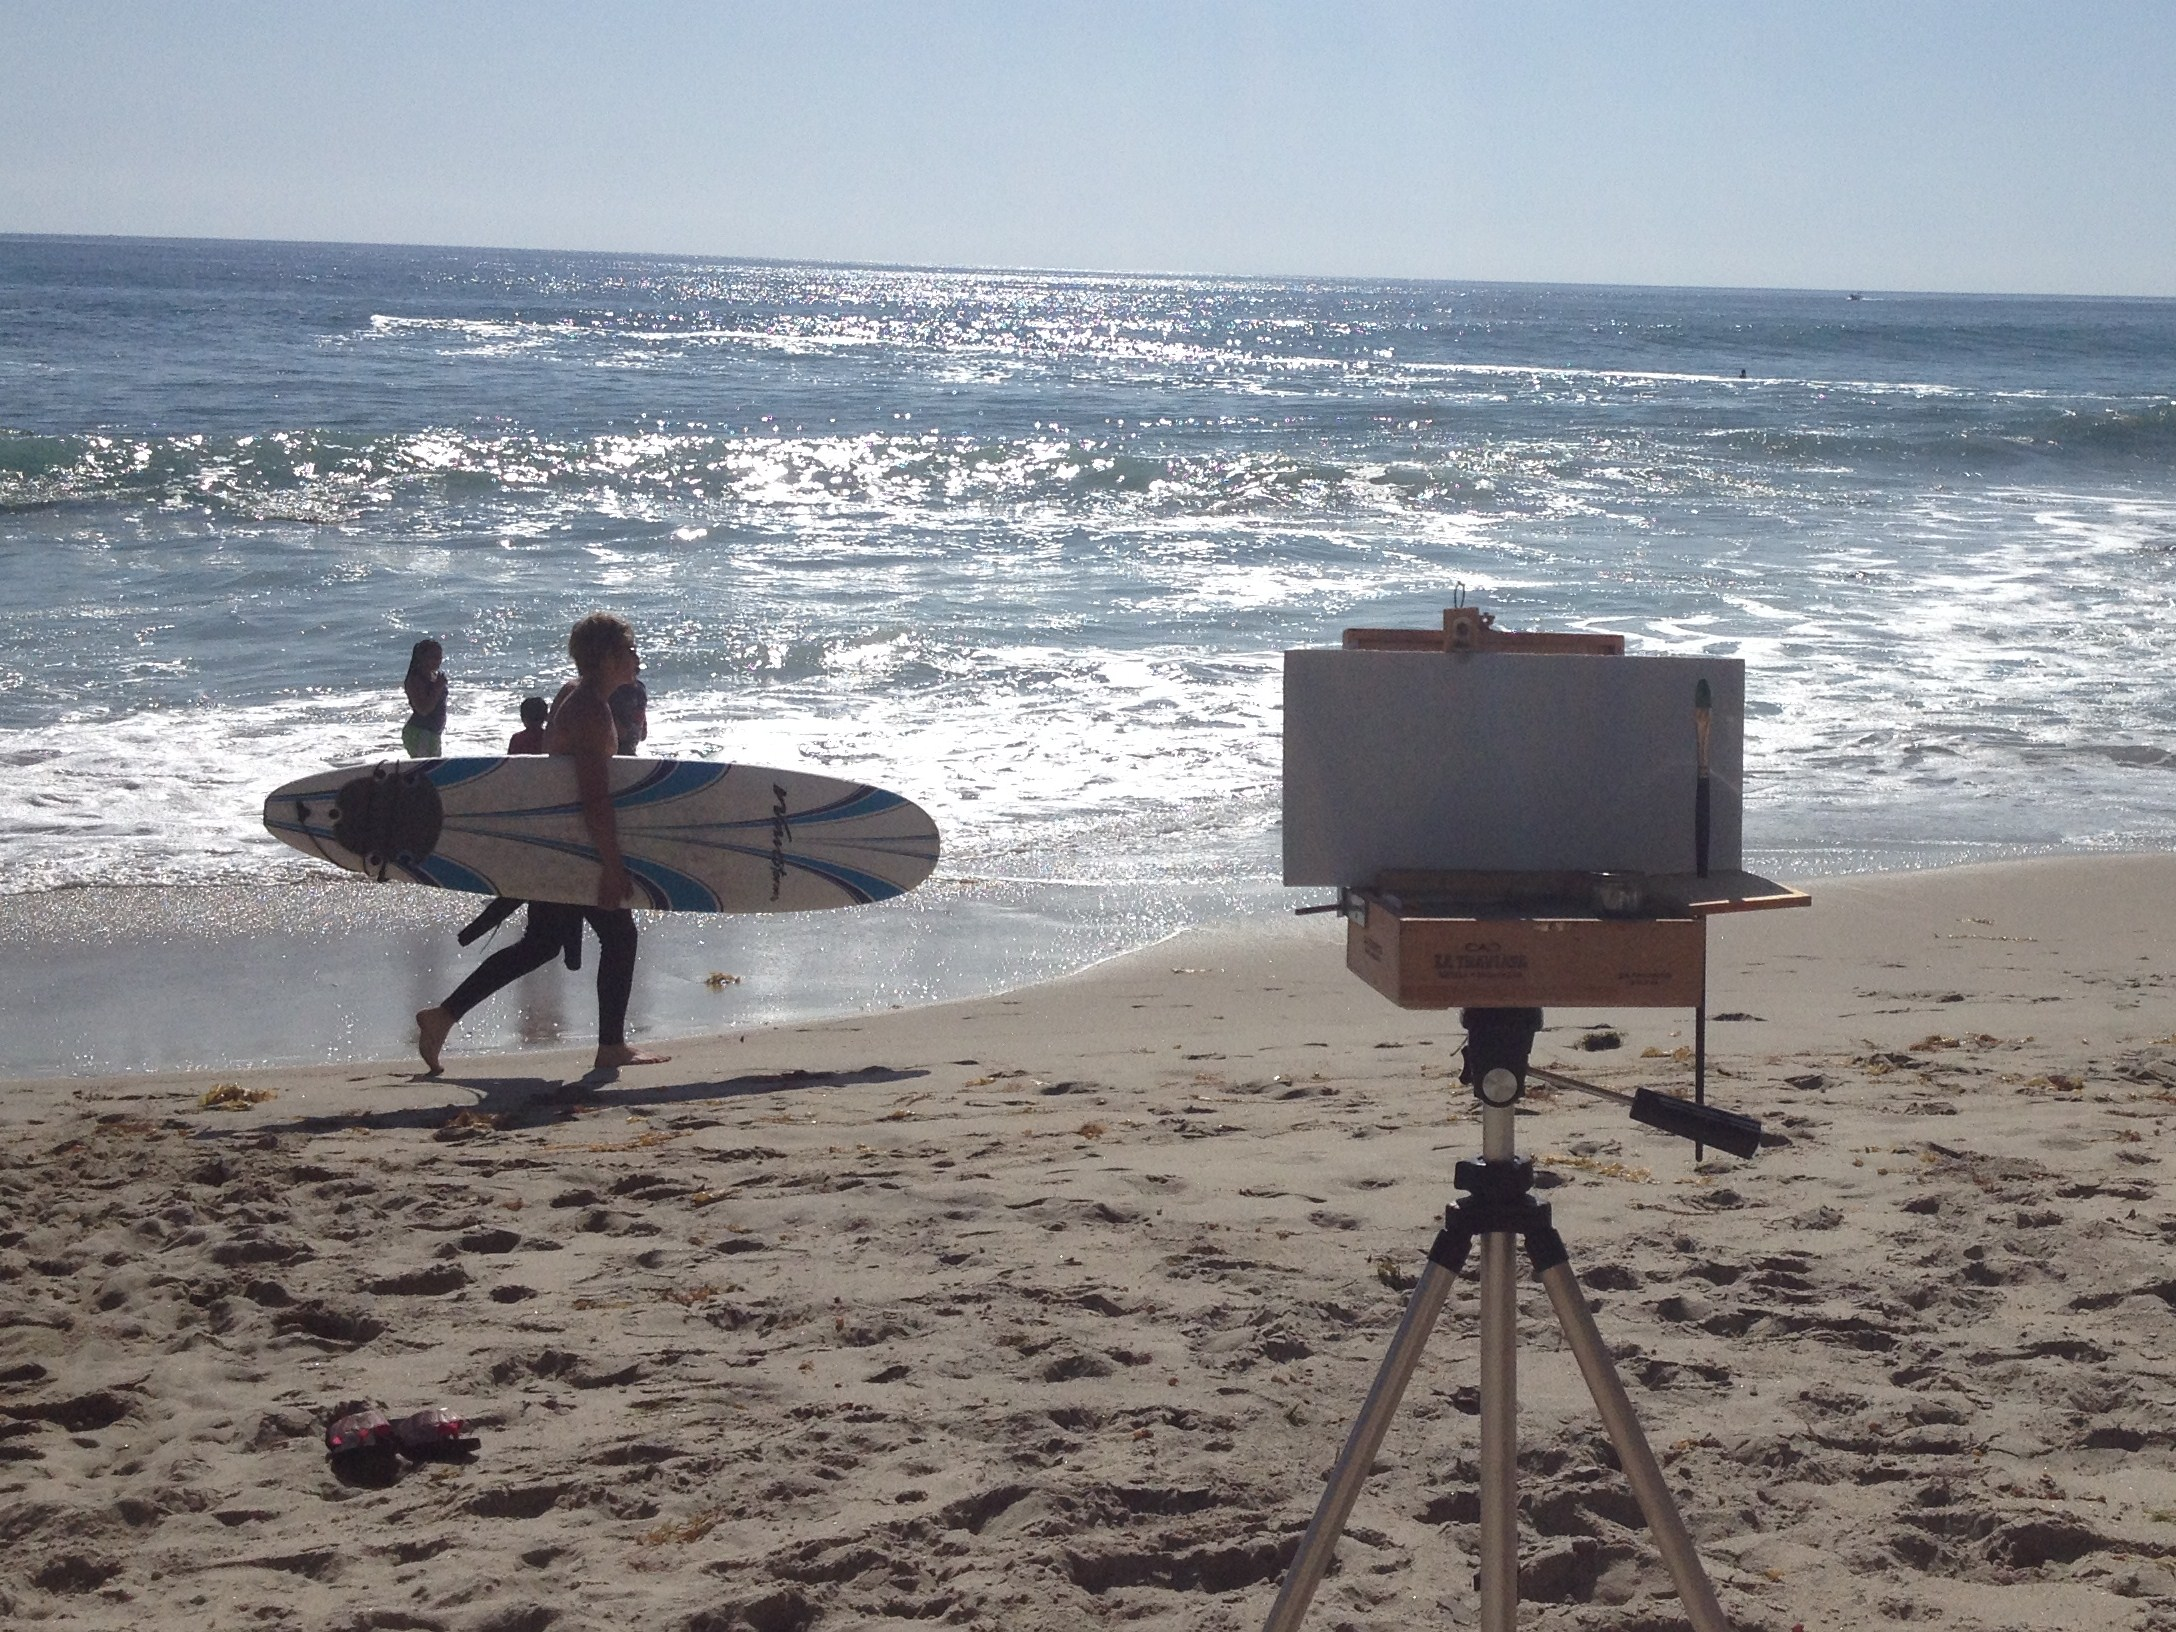 Plein Air Painting Demo: Setup